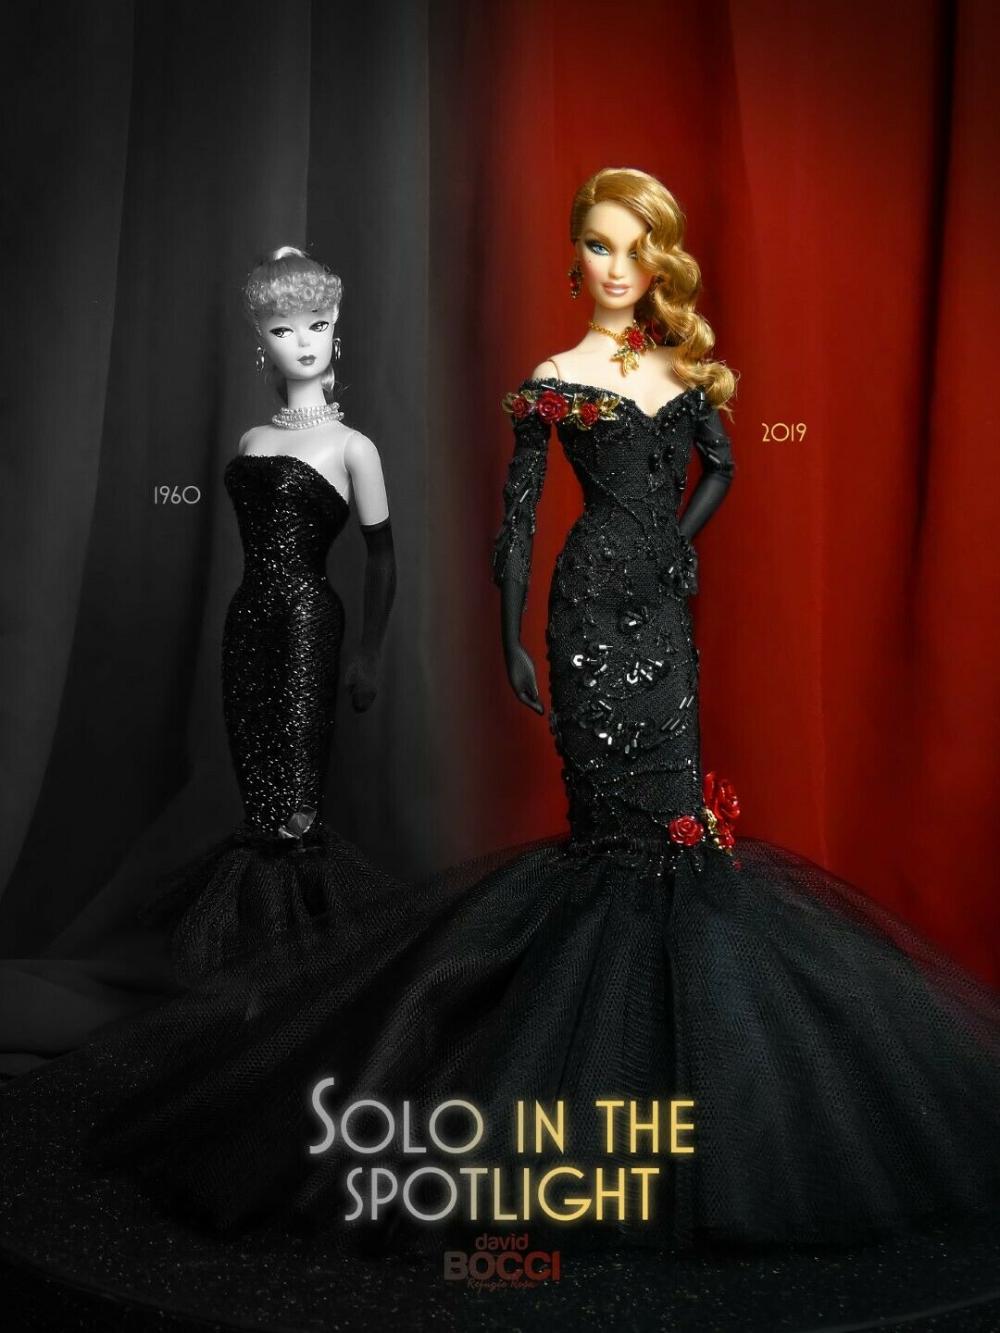 Ooak barbie doll solo in spotlight by David bocci for spanish doll convention | eBay #spanishdolls